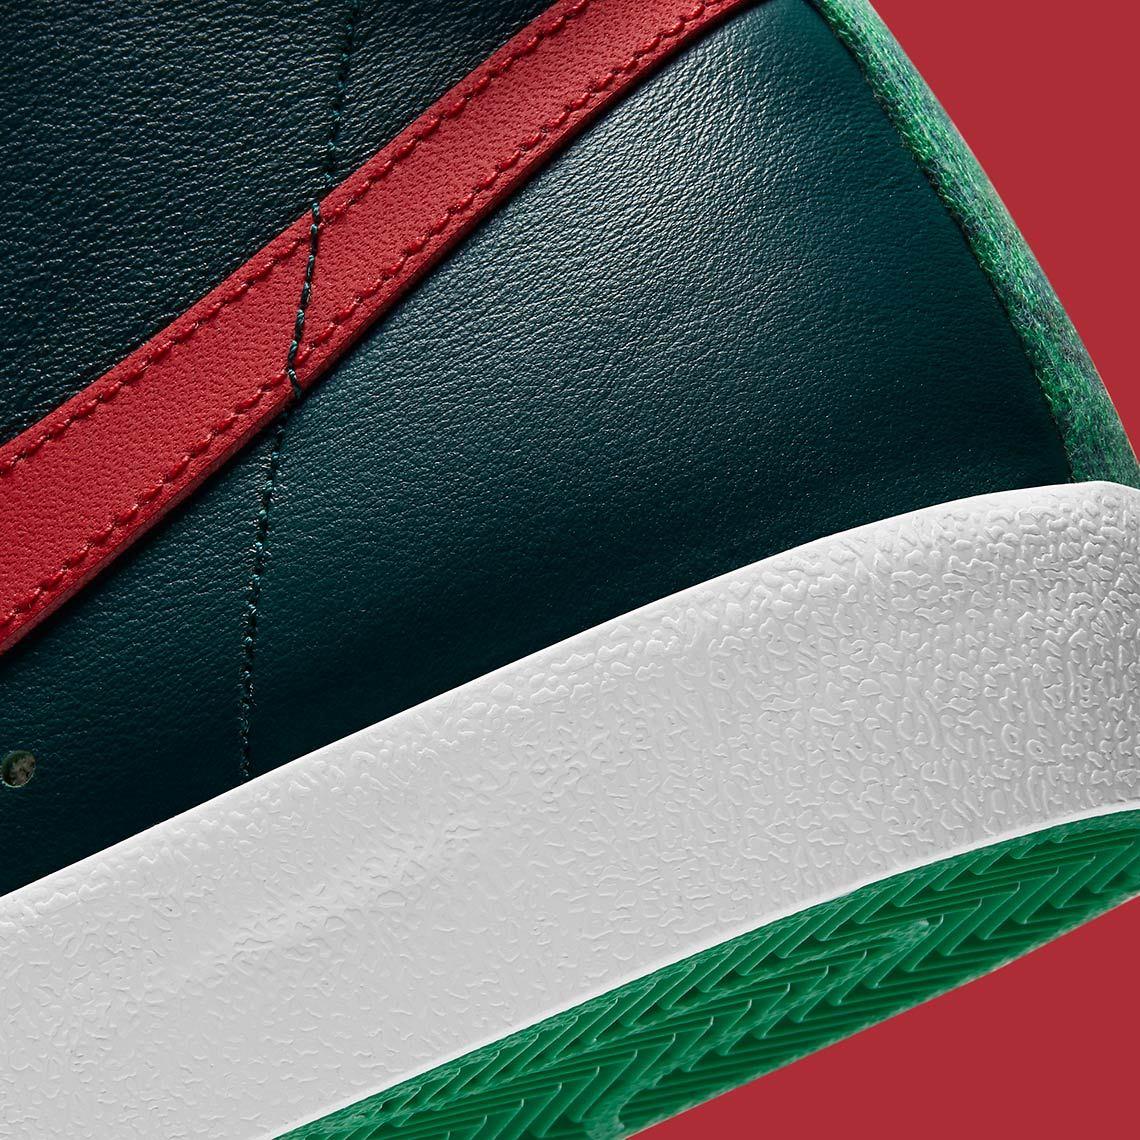 Nike Blazer Mid Christmas 2020 DC1619-300 ナイキ ブレーザー ミッド クリスマス 2020年 close heel